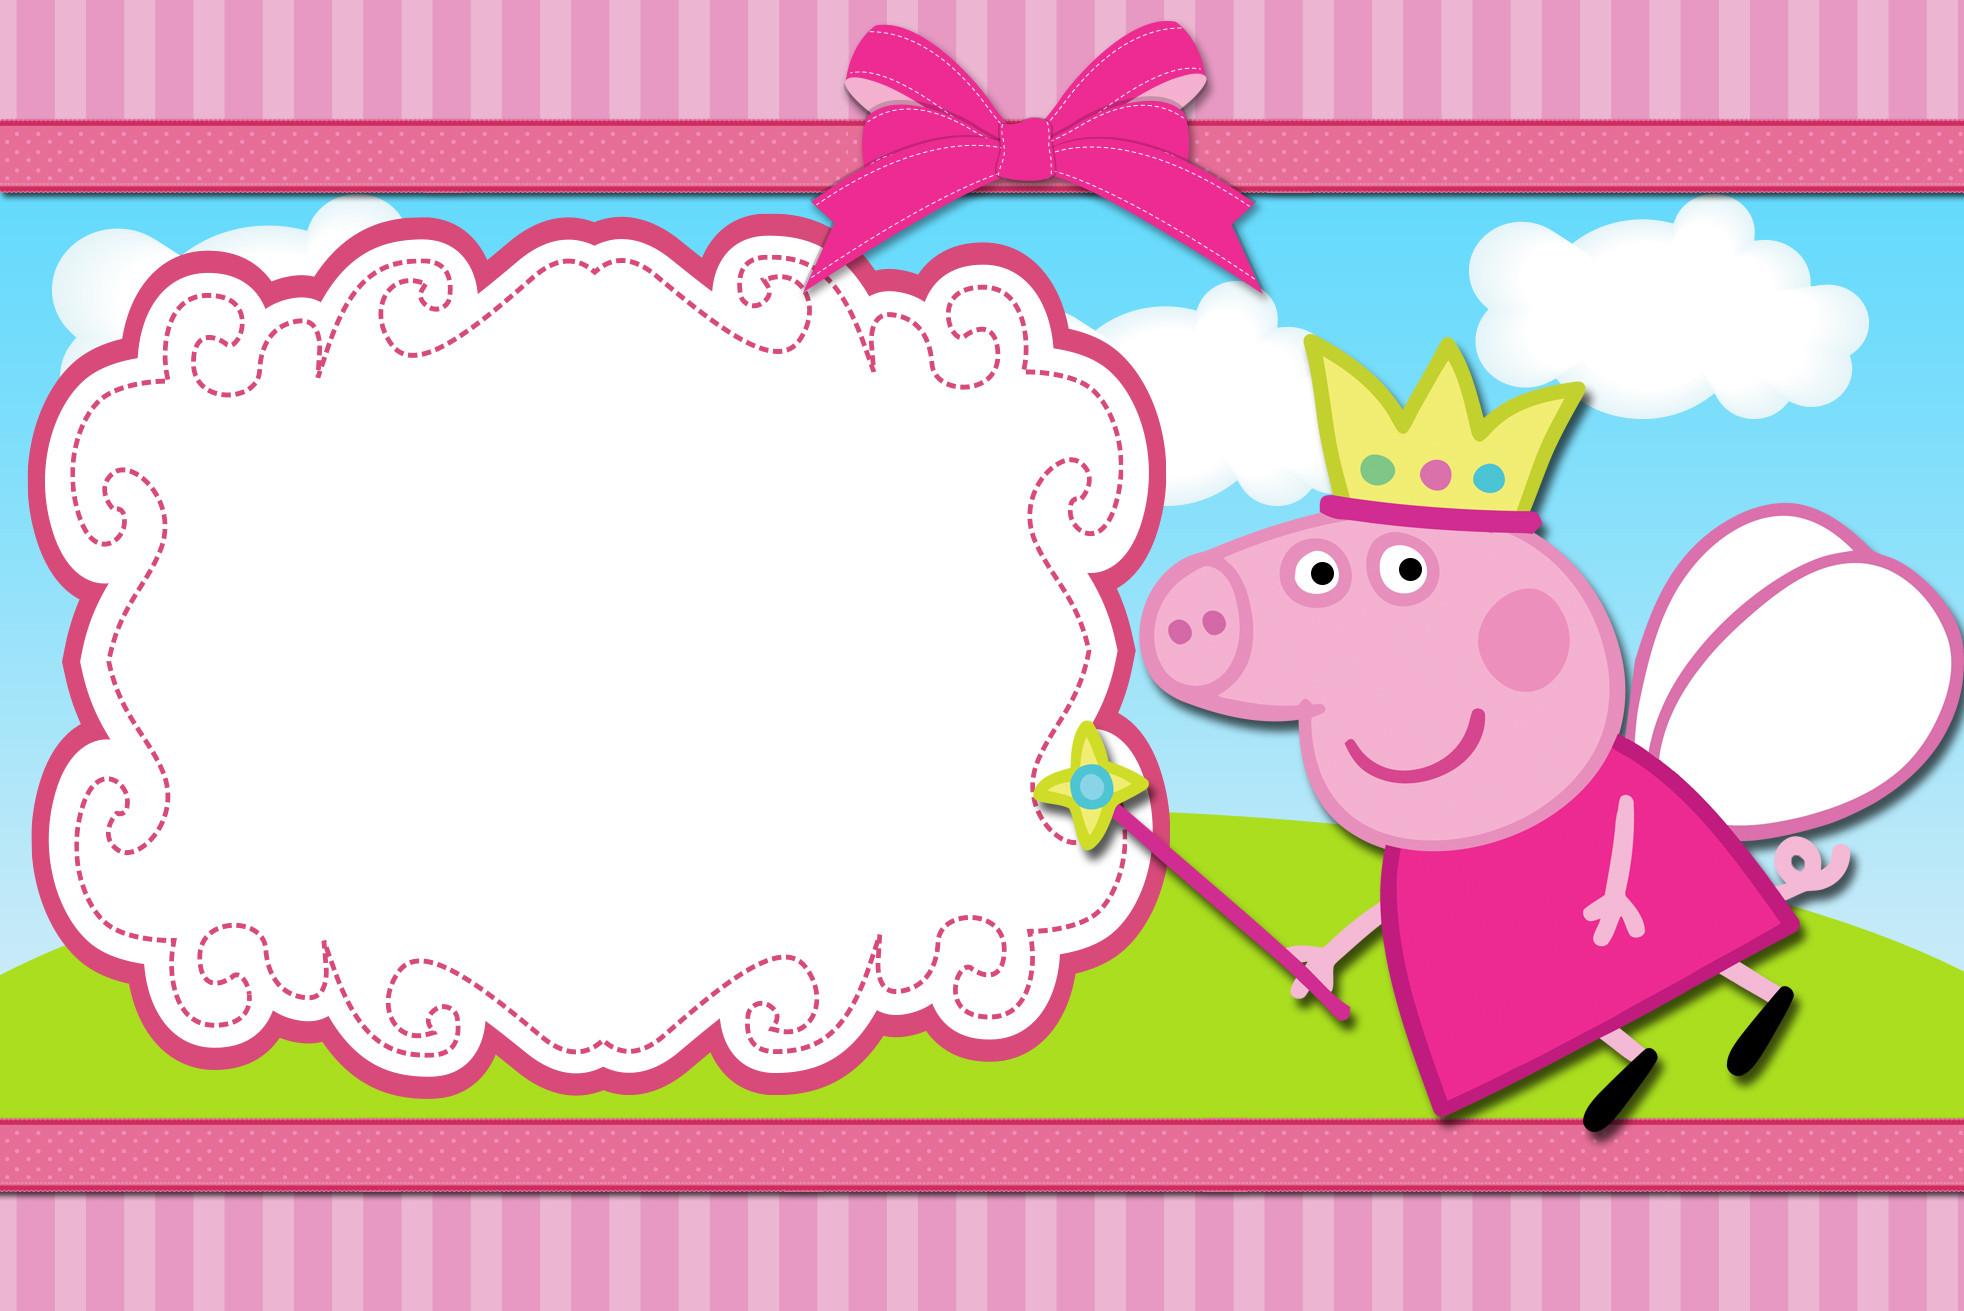 Peppa Pig Wallpaper images